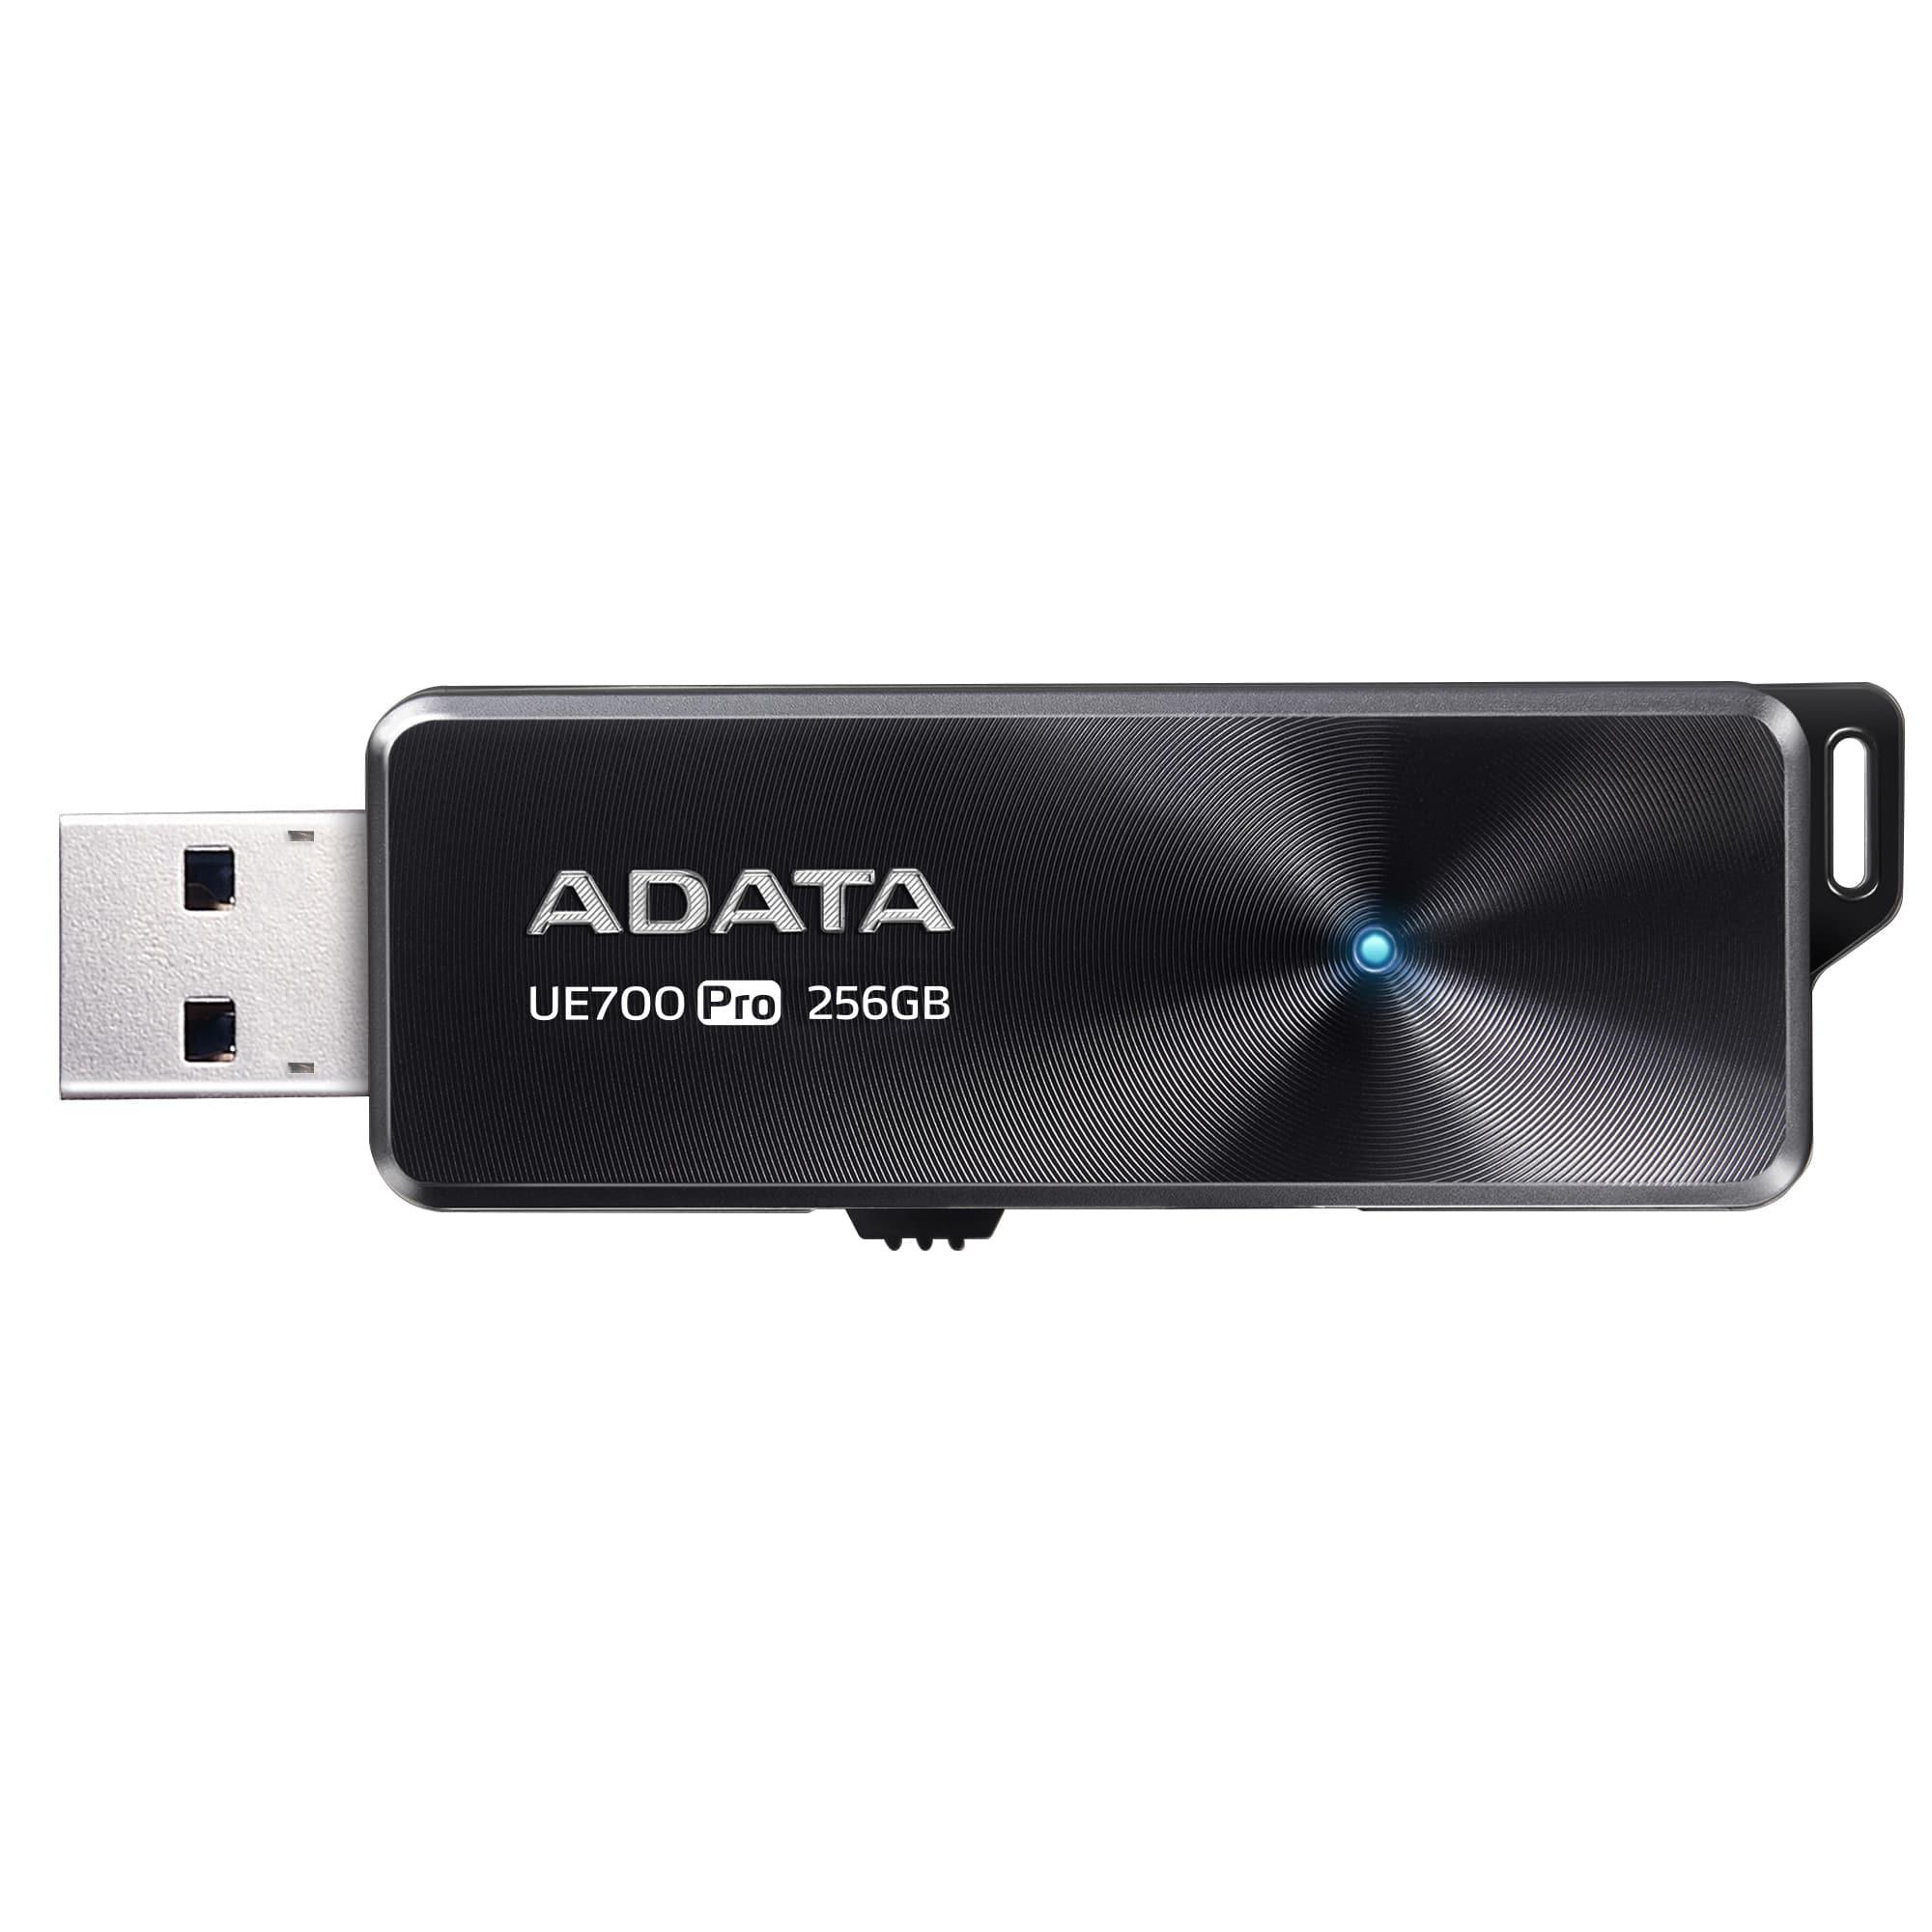 Fotografie Memorie USB ADATA UE700PRO, 256GB, USB 3.1, Negru